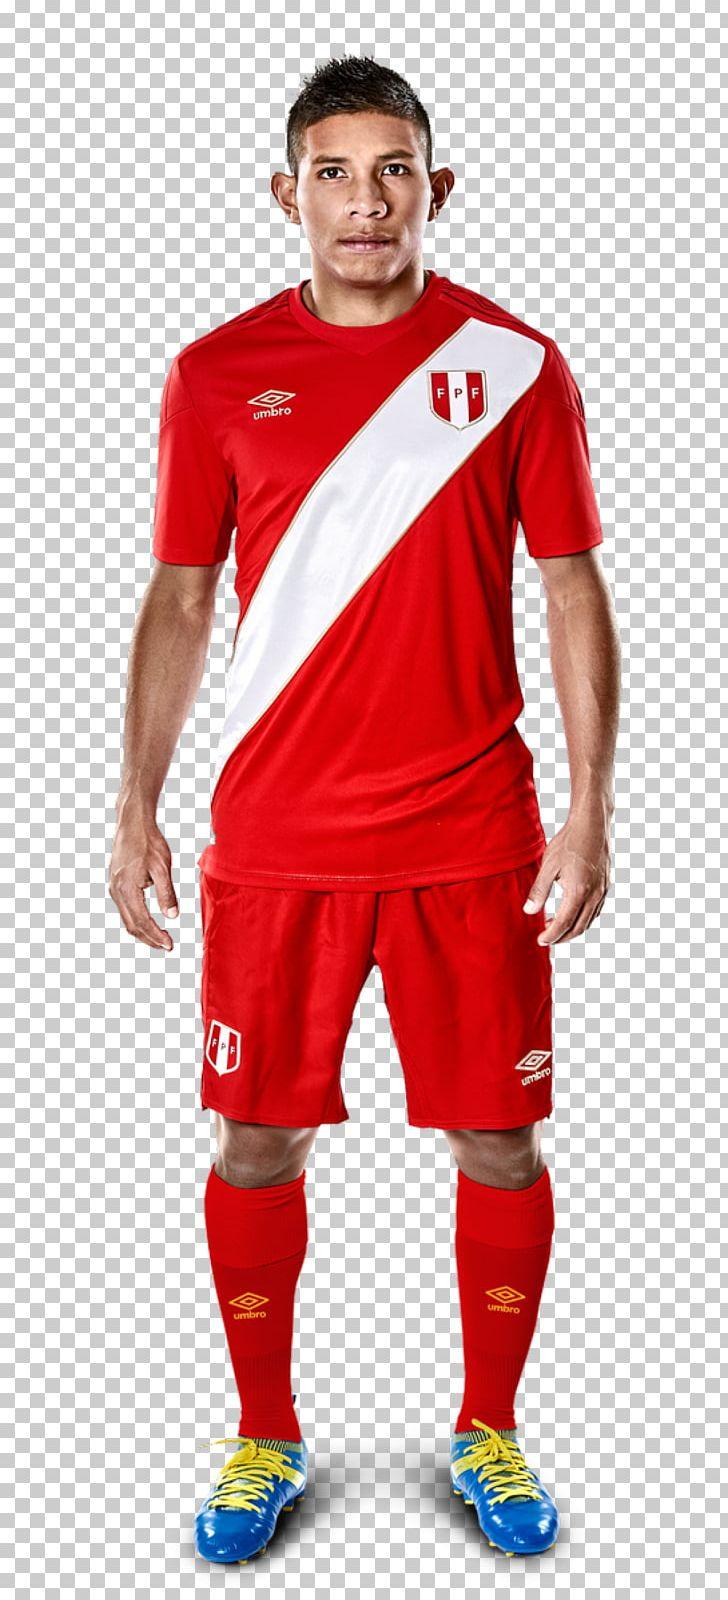 World cup shirt peru clipart clipart royalty free stock Peru National Football Team 2018 World Cup Iceland National ... clipart royalty free stock